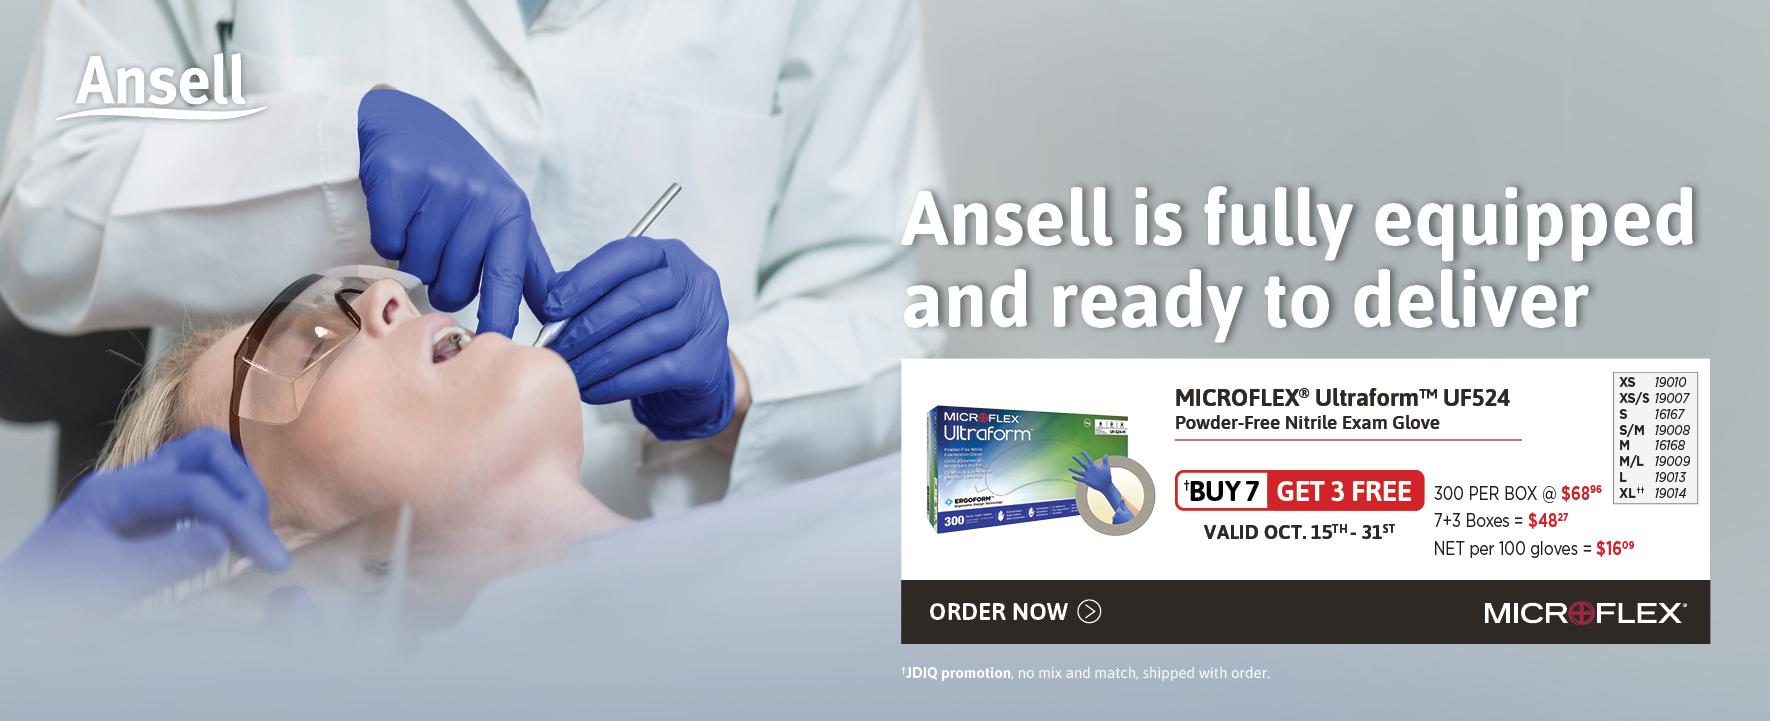 Ansell Ultraform Gloves